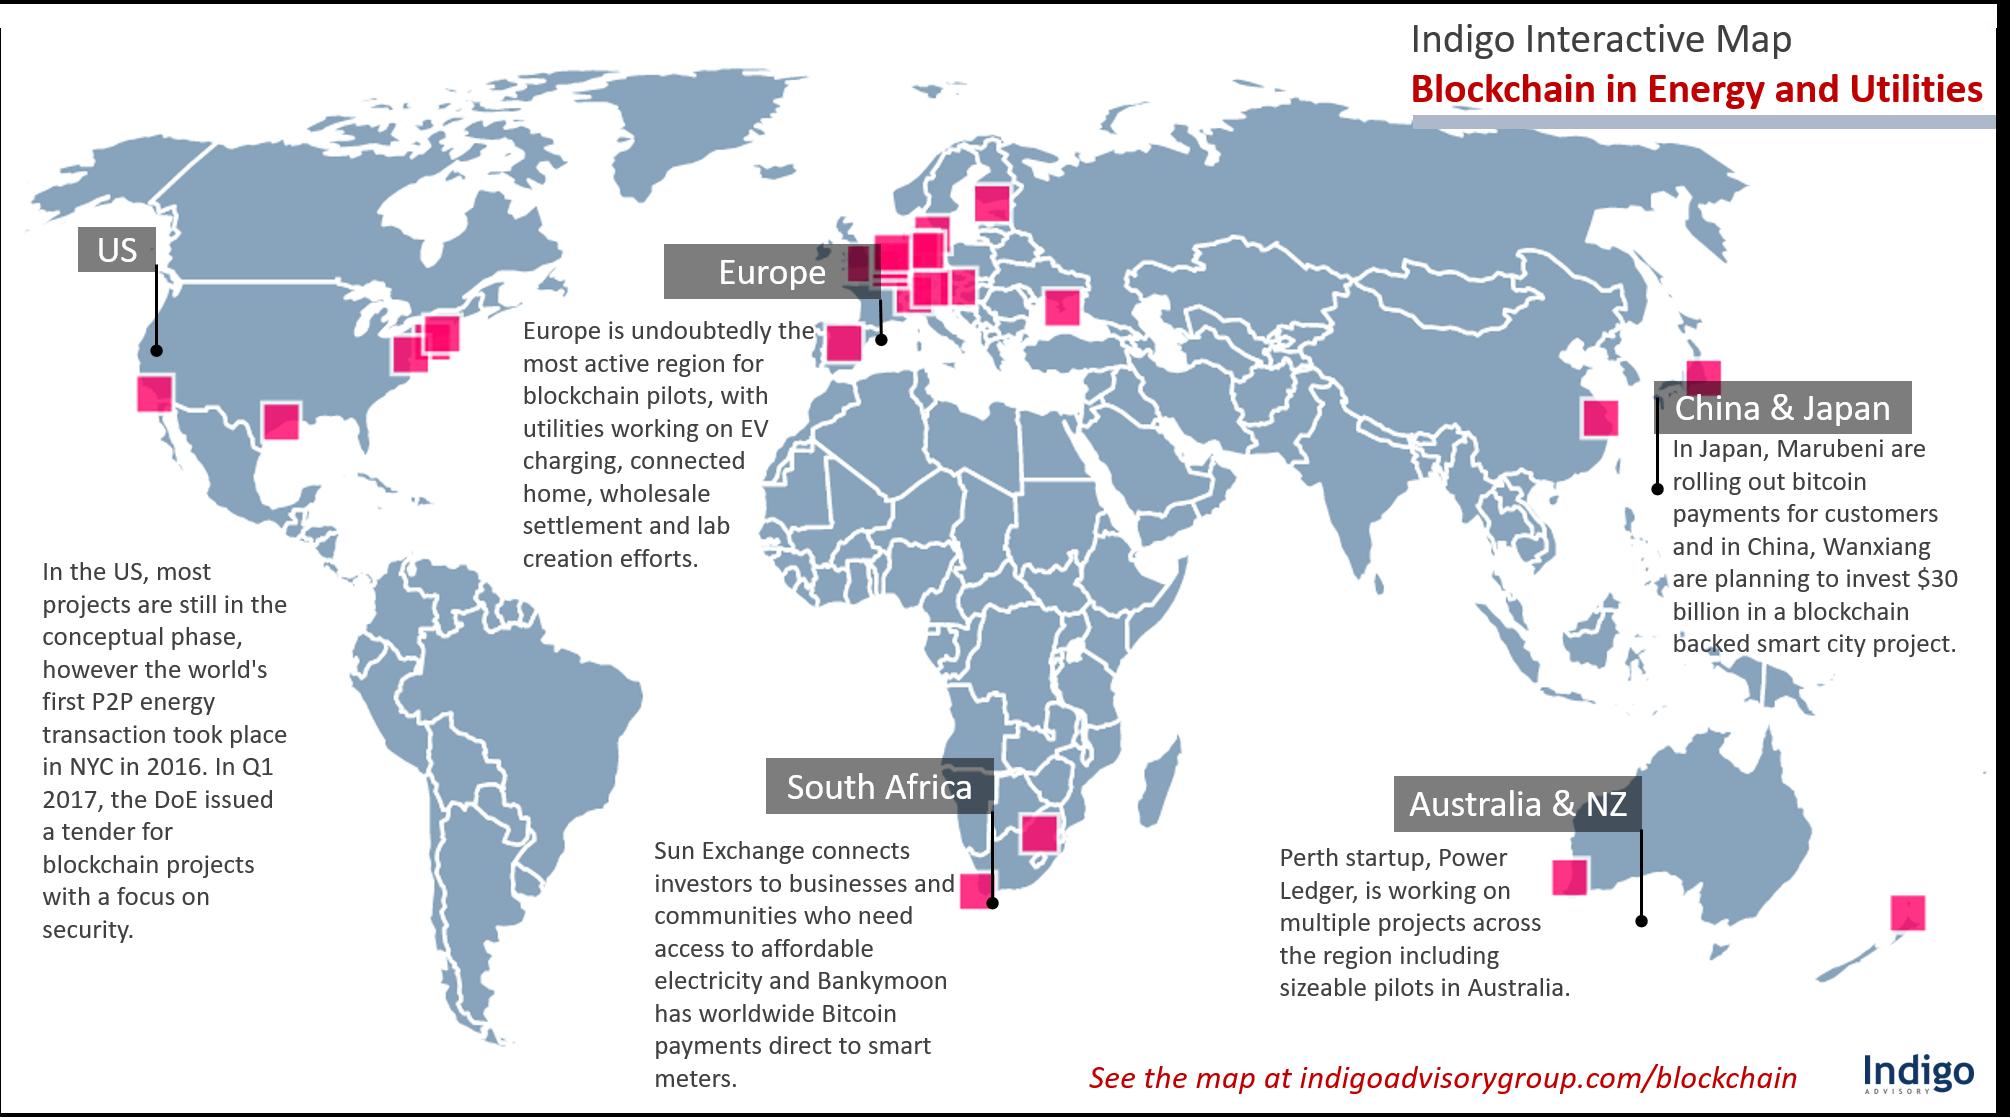 Global Interactive Blockchain in Energy and Utilities Interactive Map